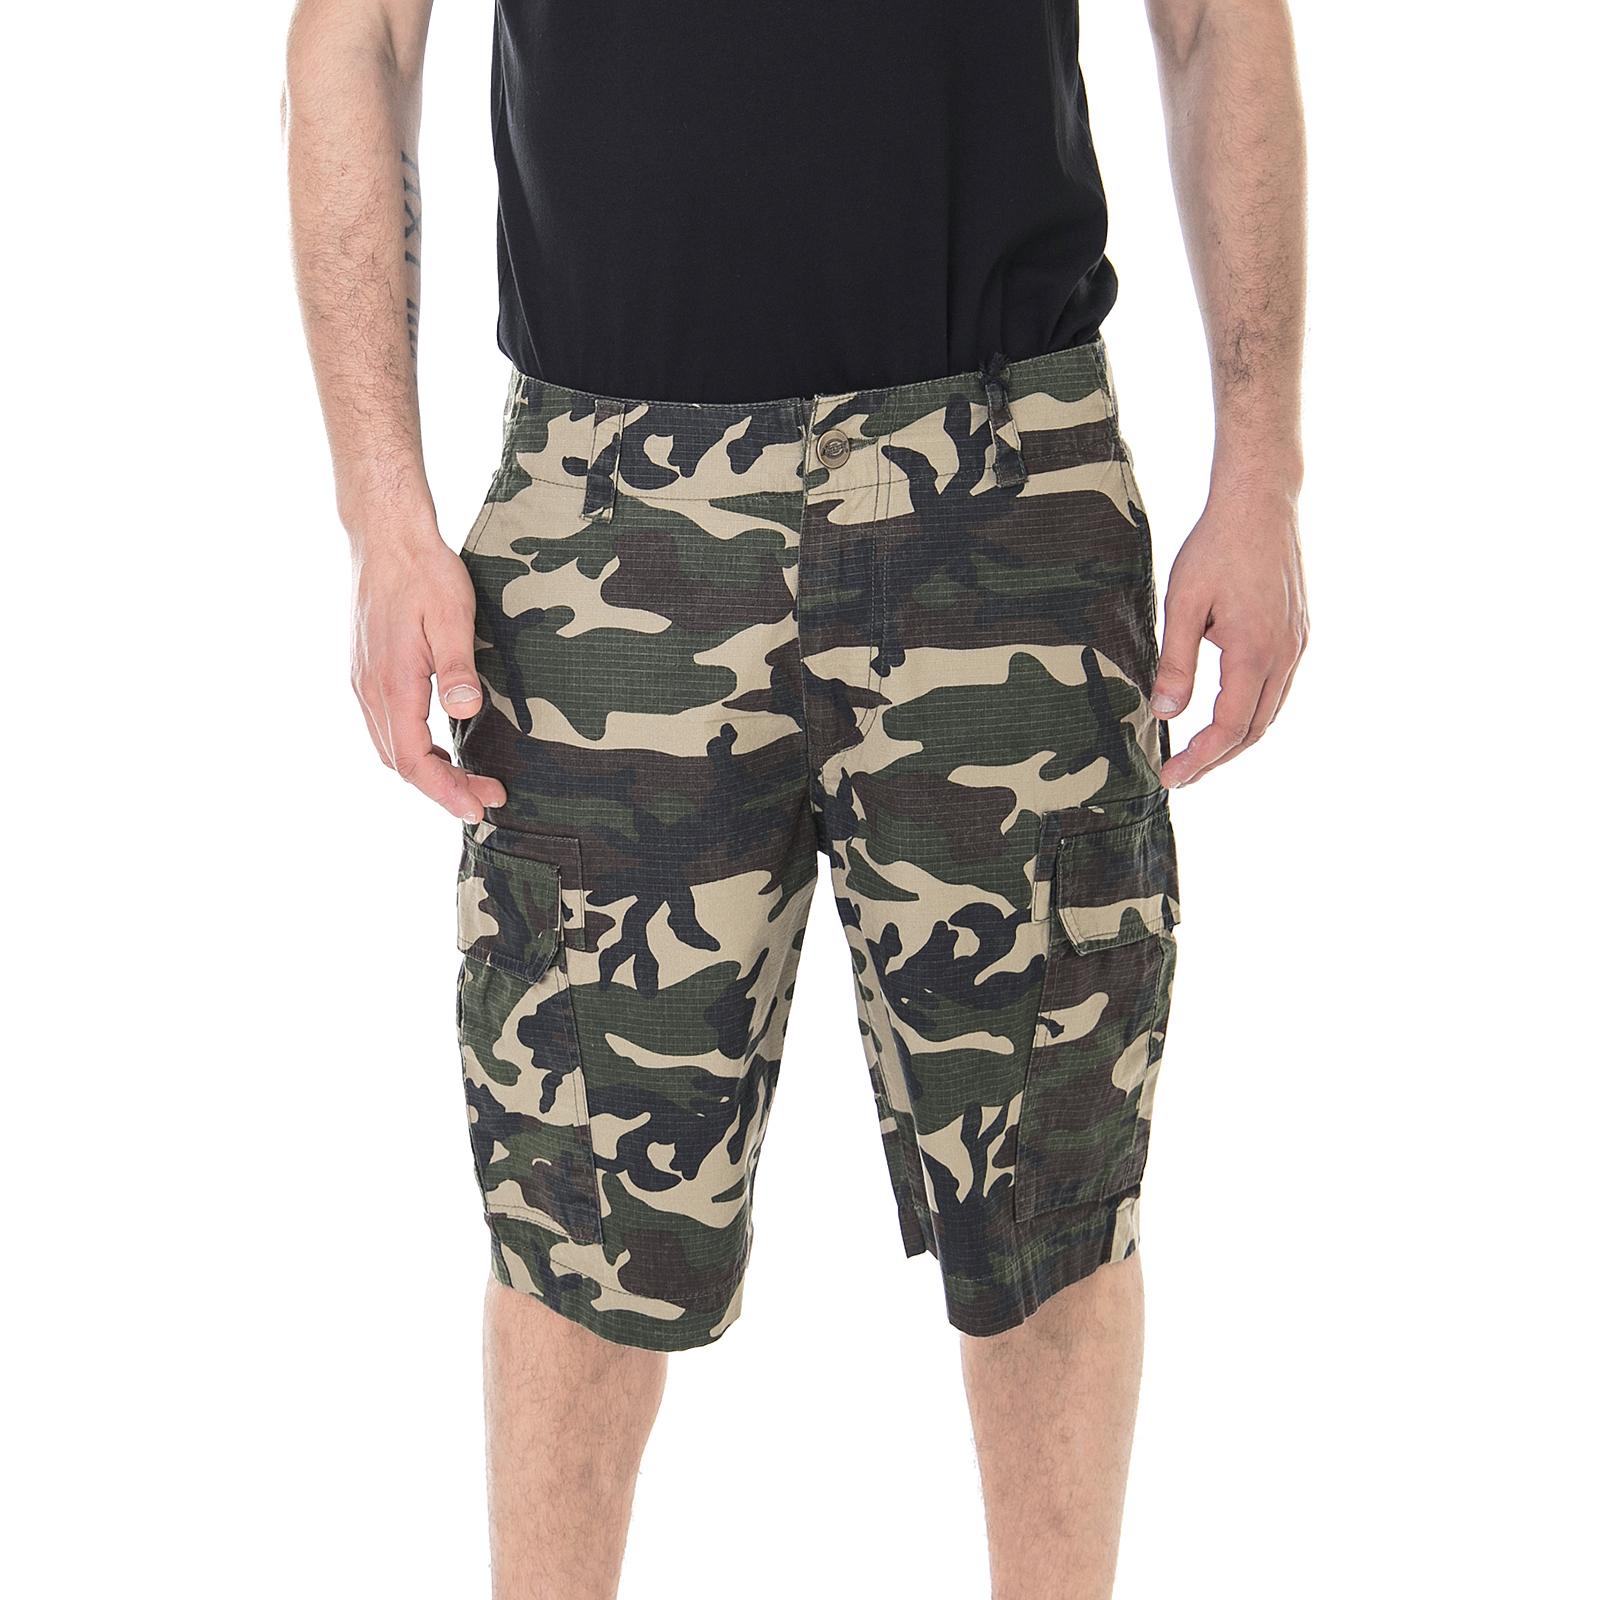 88011c7d27 Dickies Shorts New York Short Camouflage Camo | eBay